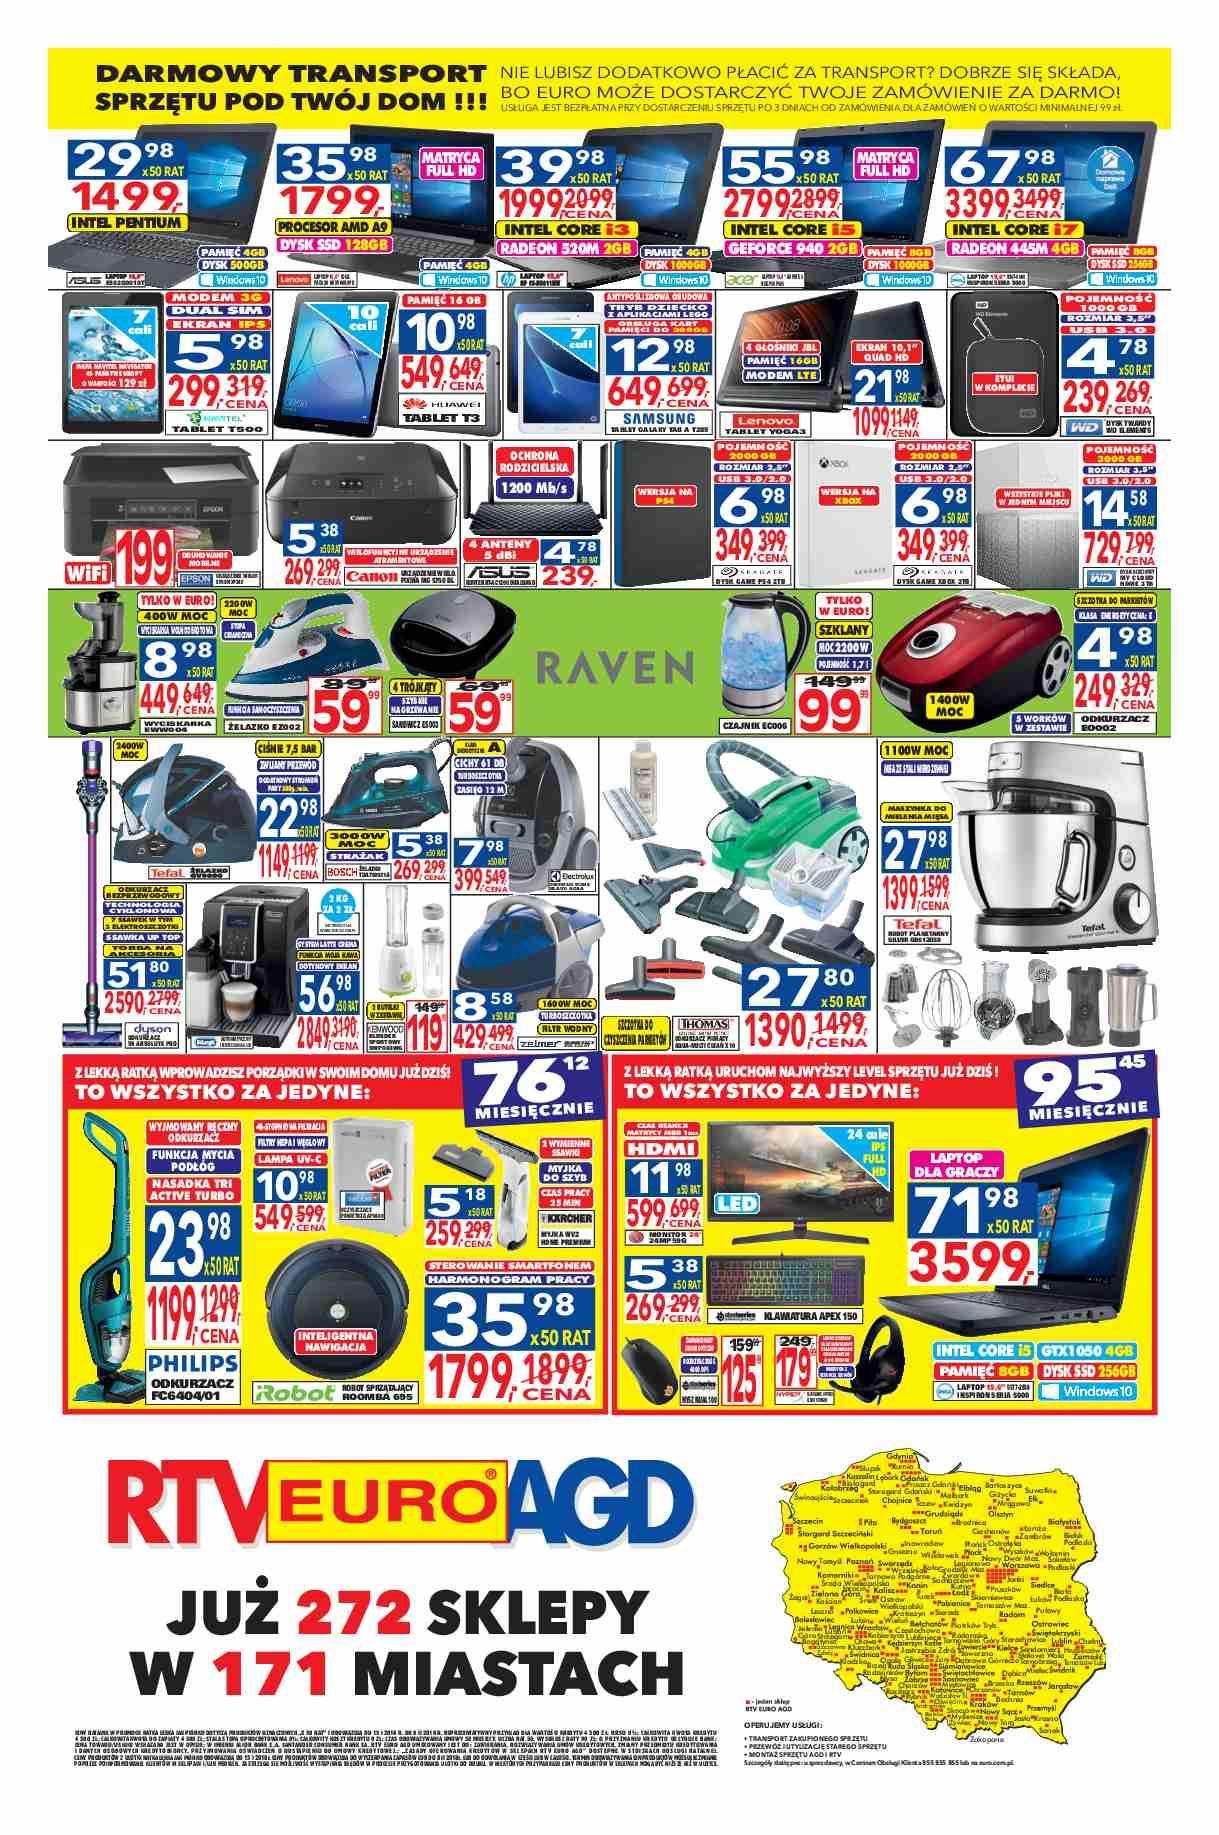 Gazetka promocyjna RTV Euro AGD do 08/02/2018 str.3